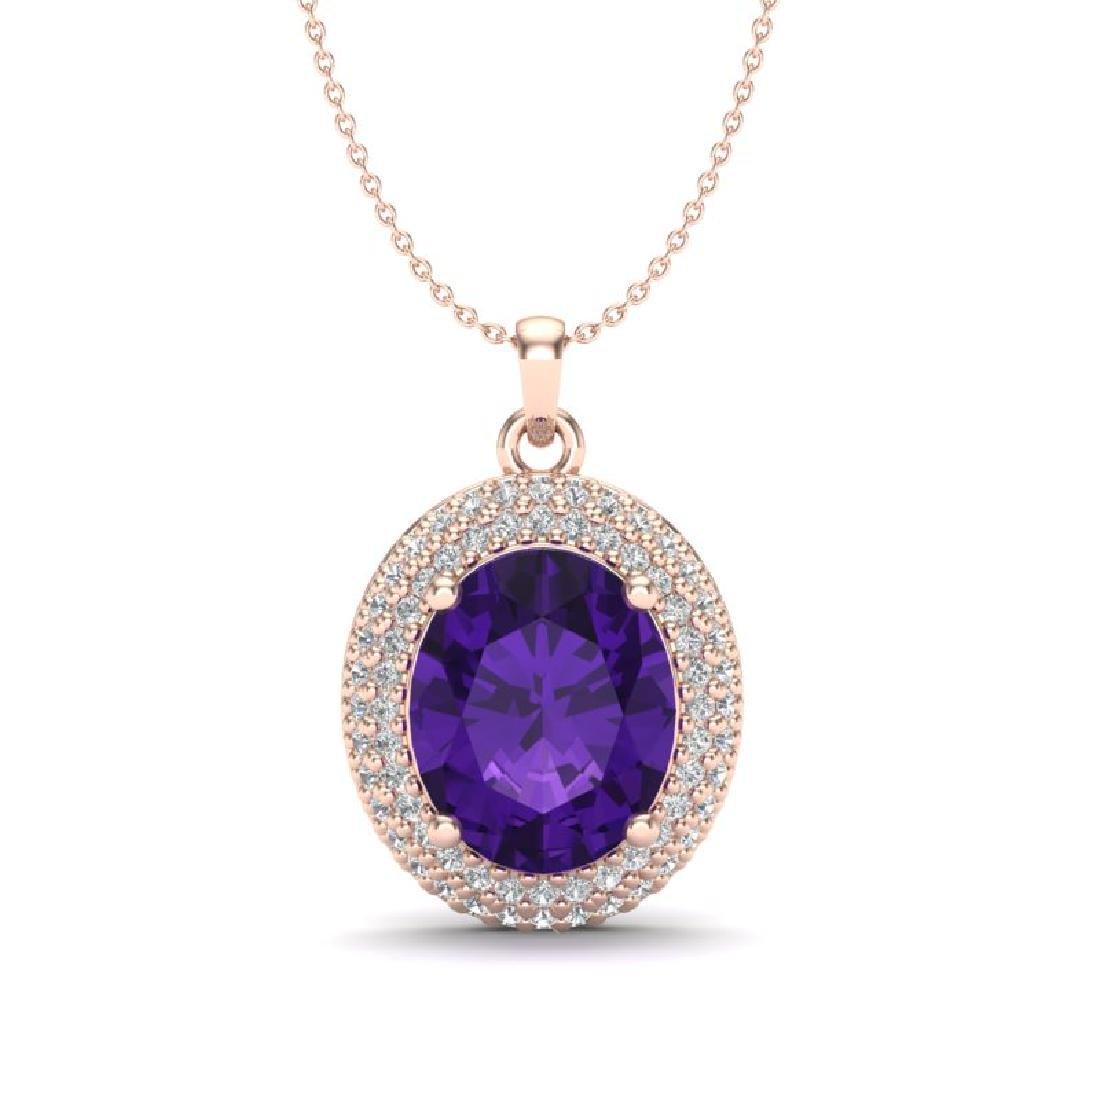 4 CTW Amethyst & Micro Pave VS/SI Diamond Necklace 14K